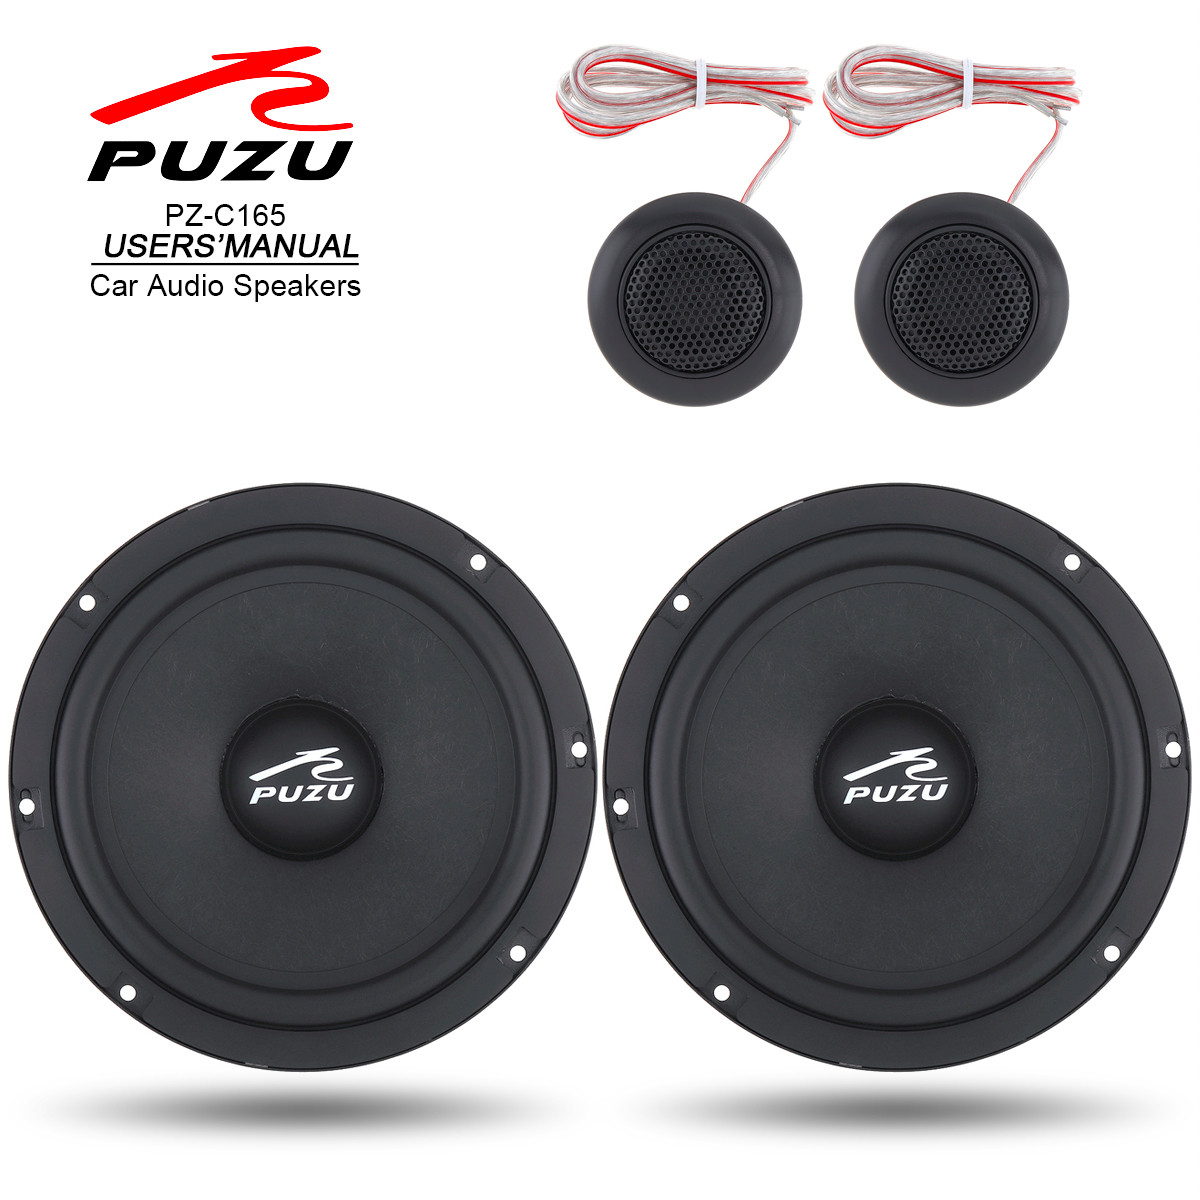 2pcs 6 5 Inch 180W Car Coaxial Speaker Loudspeak Full Range Frequency Stereo Loud Speakers with